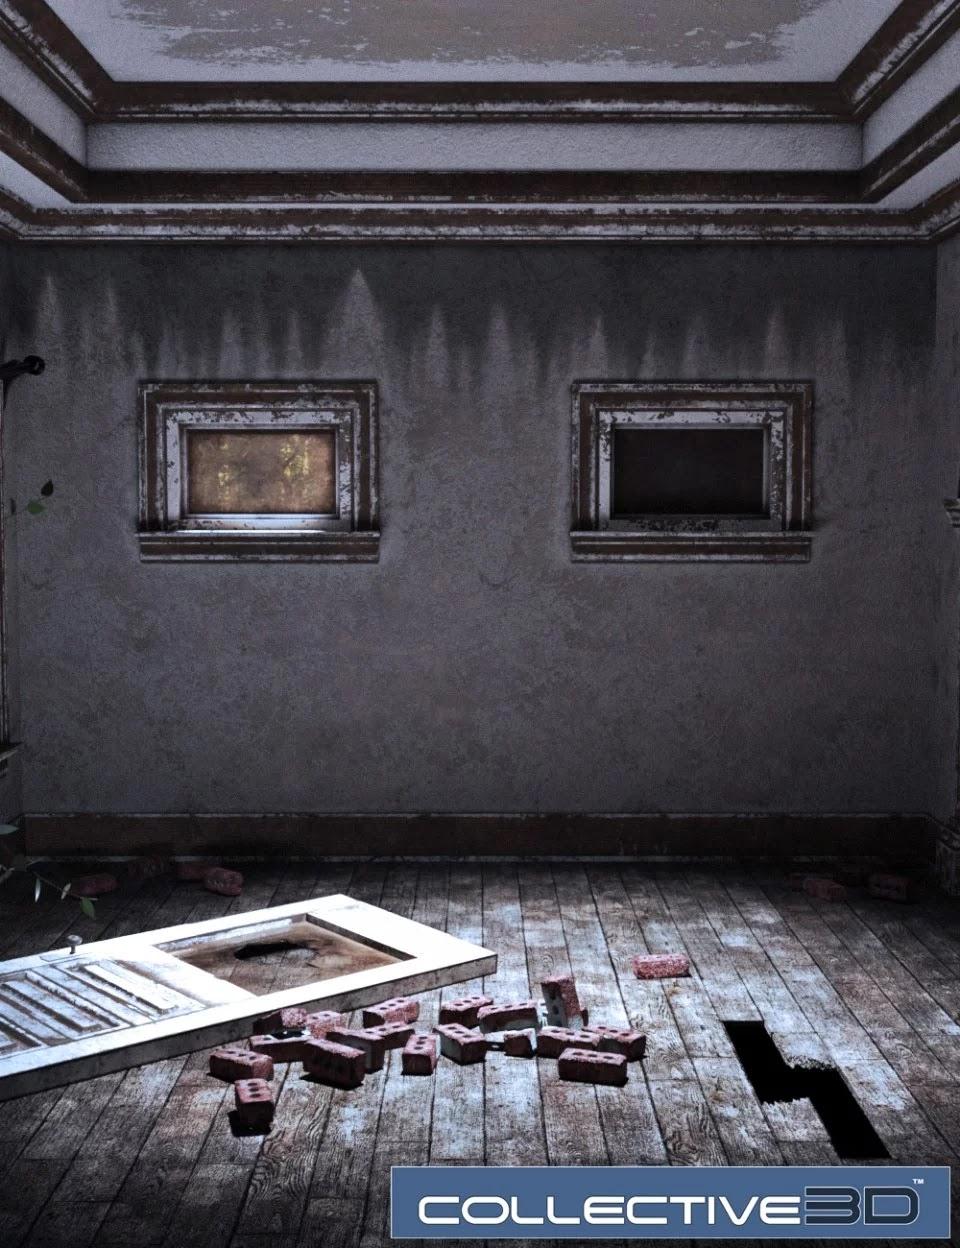 Collective3d Movie Sets Haunted Interior_DAZ3D下载站